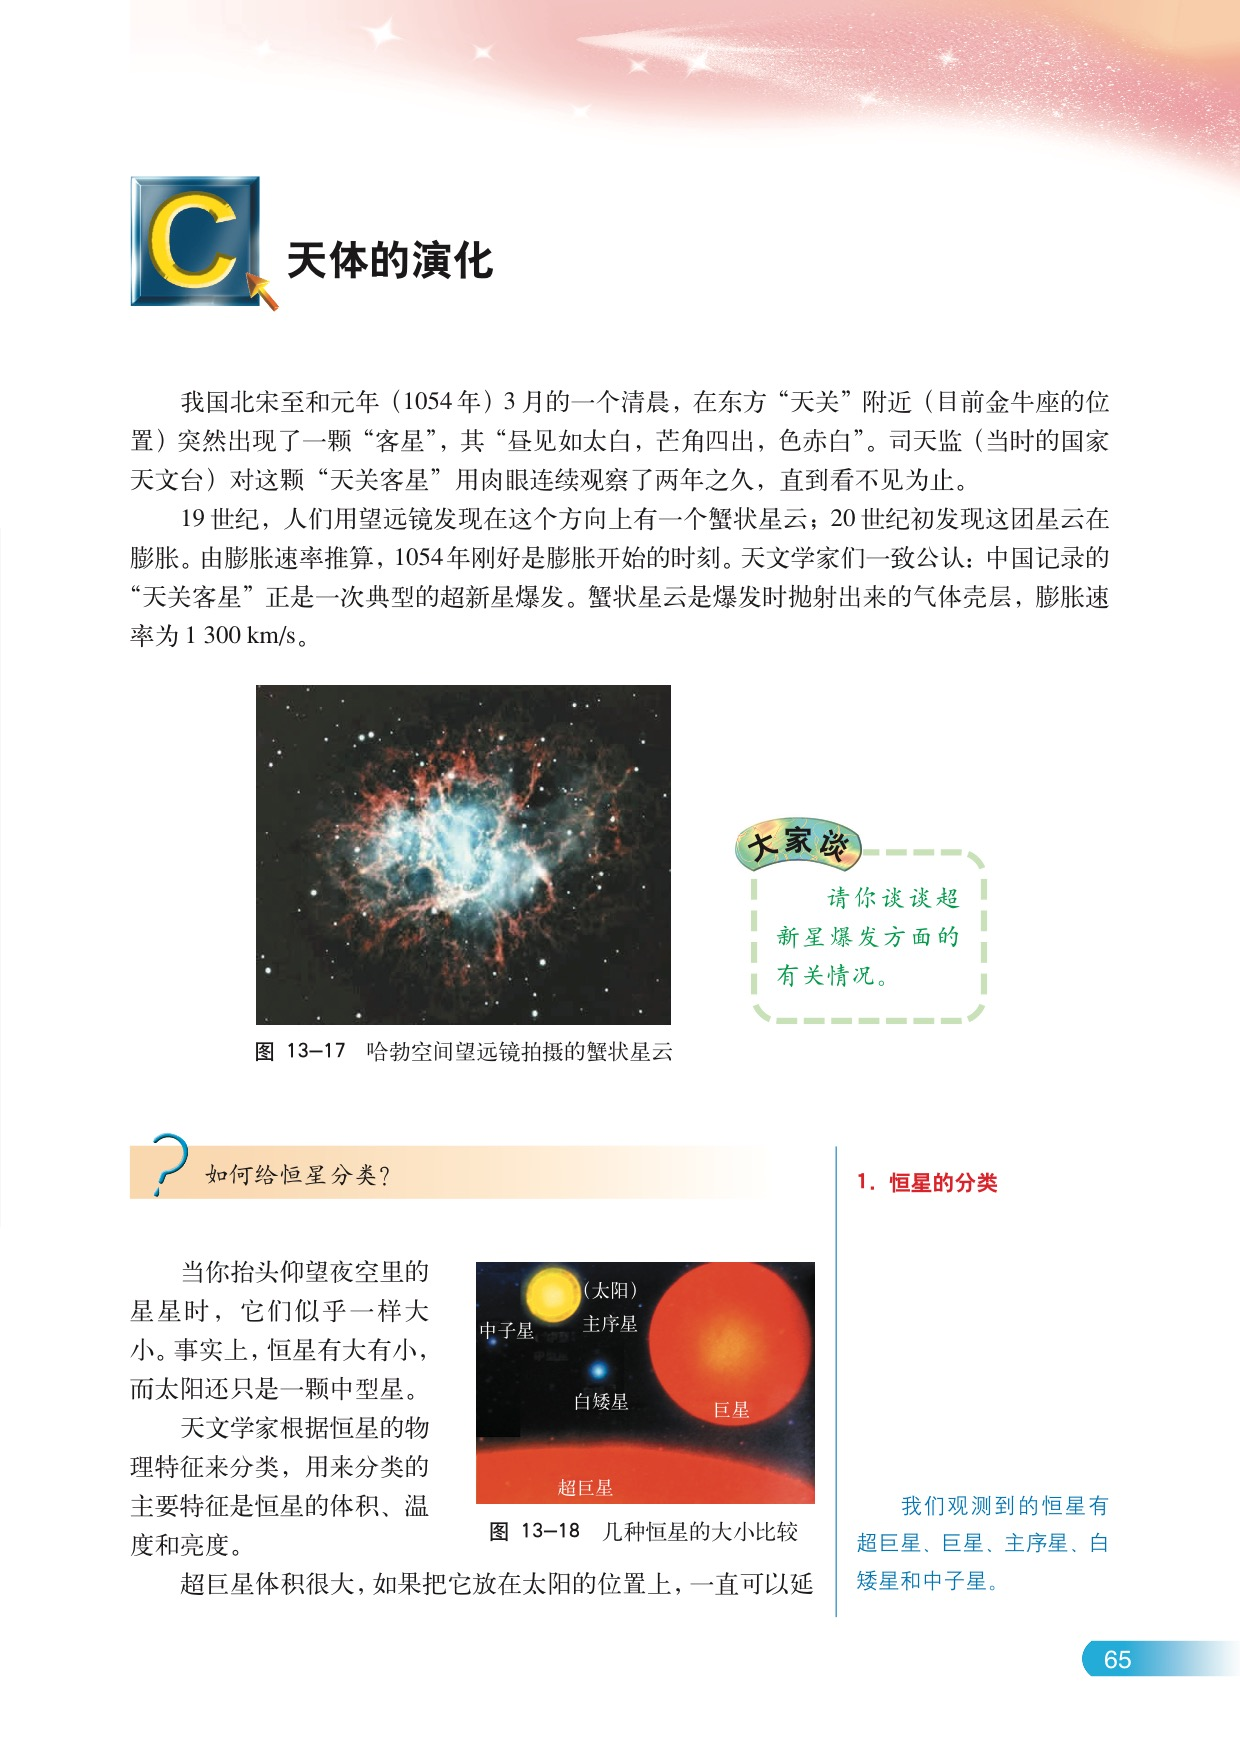 C.天体的演化